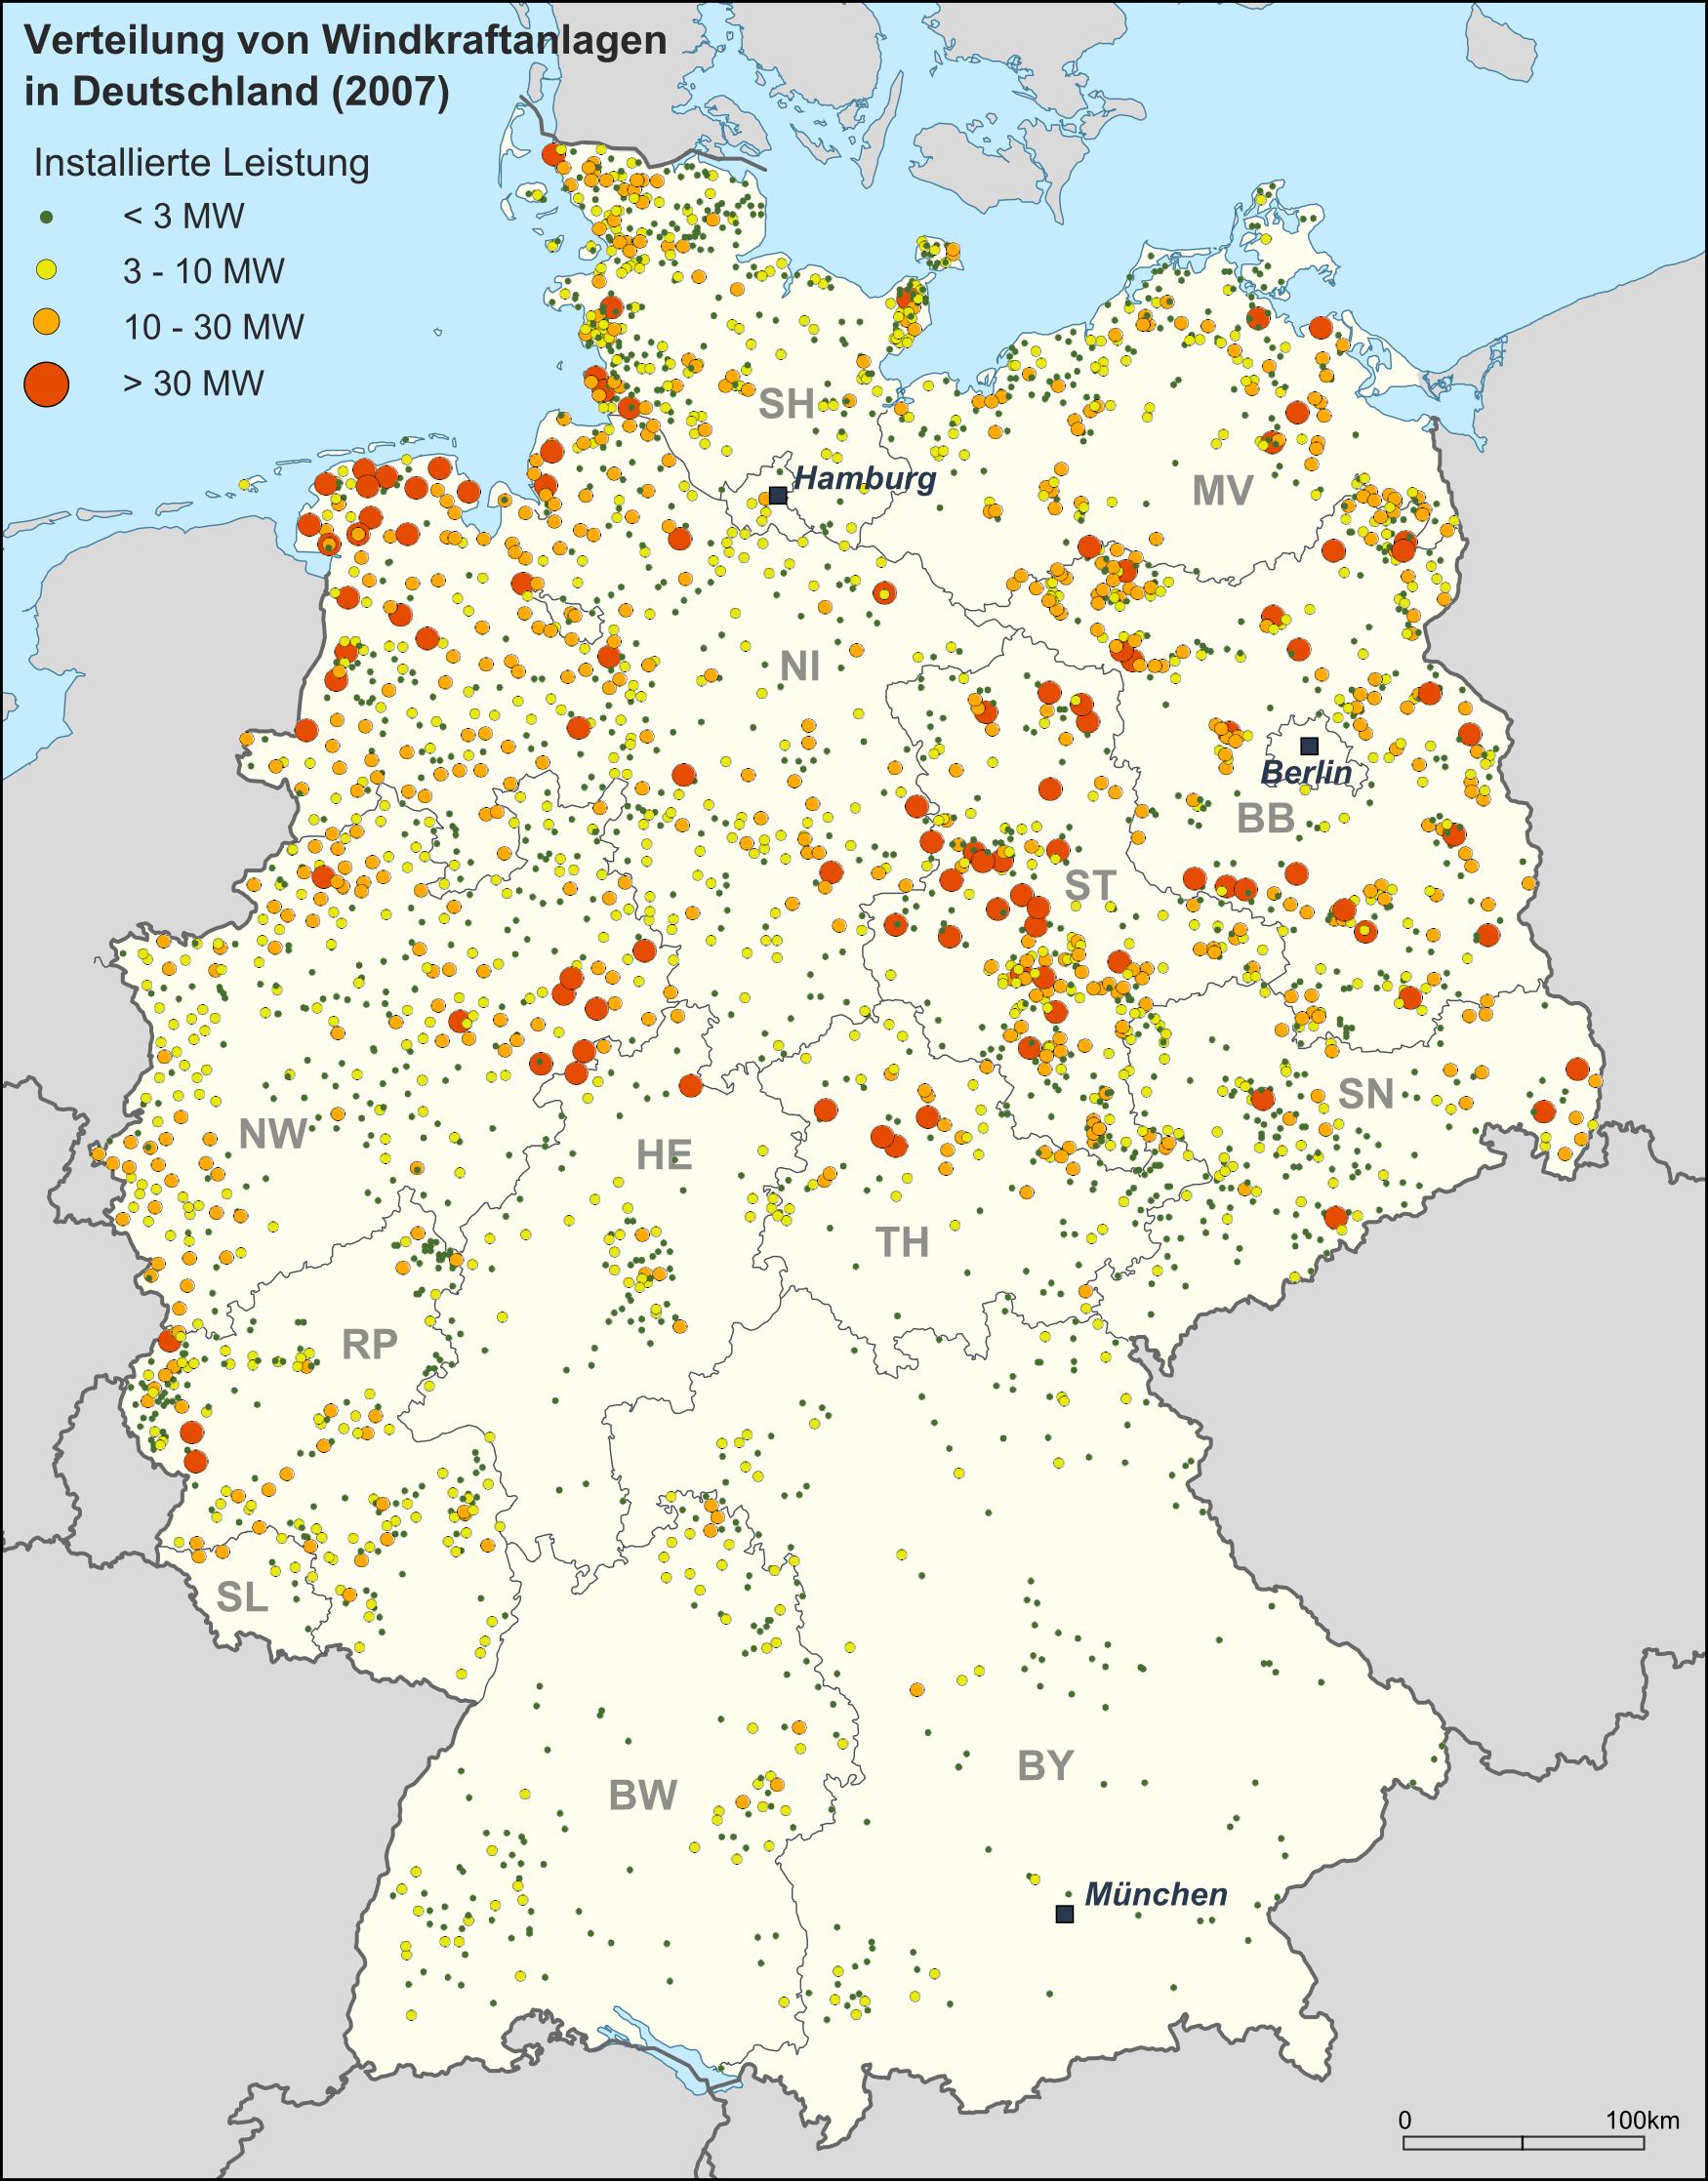 Wind farms in Germany 2008